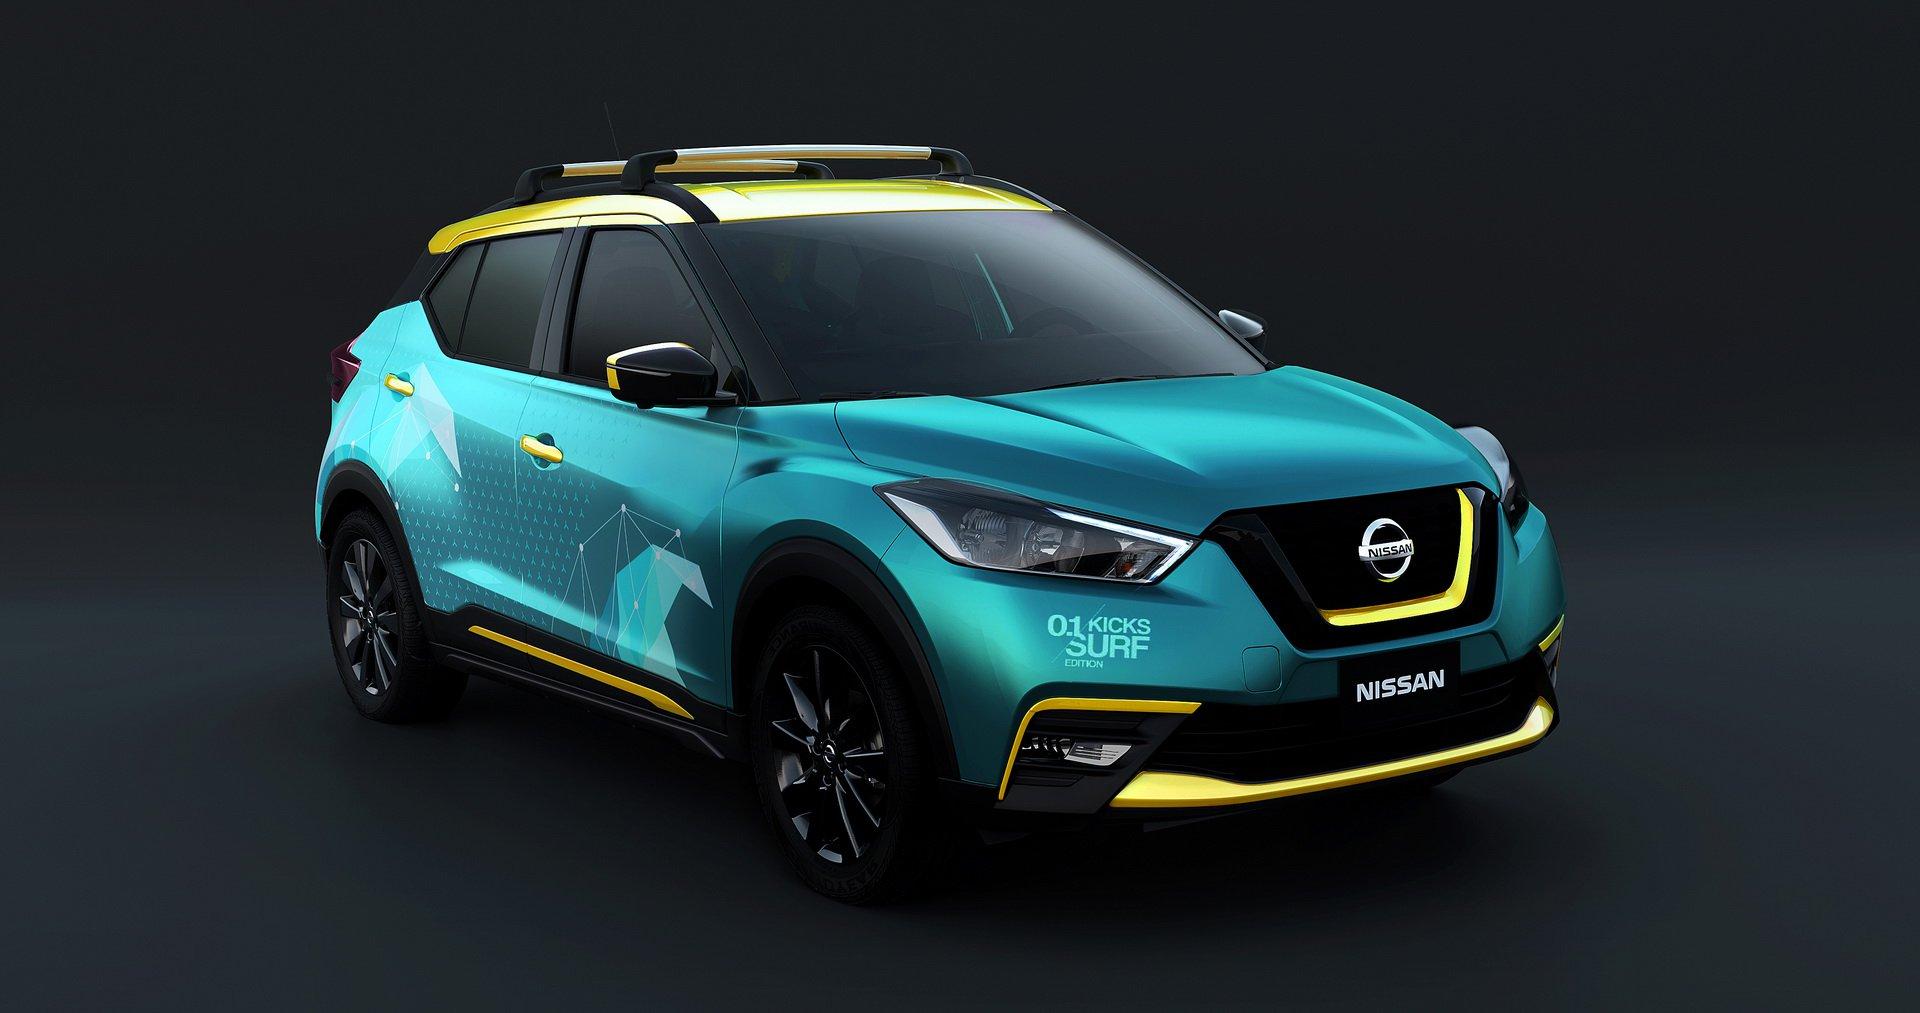 Nissan Kicks Surf Concept (2)